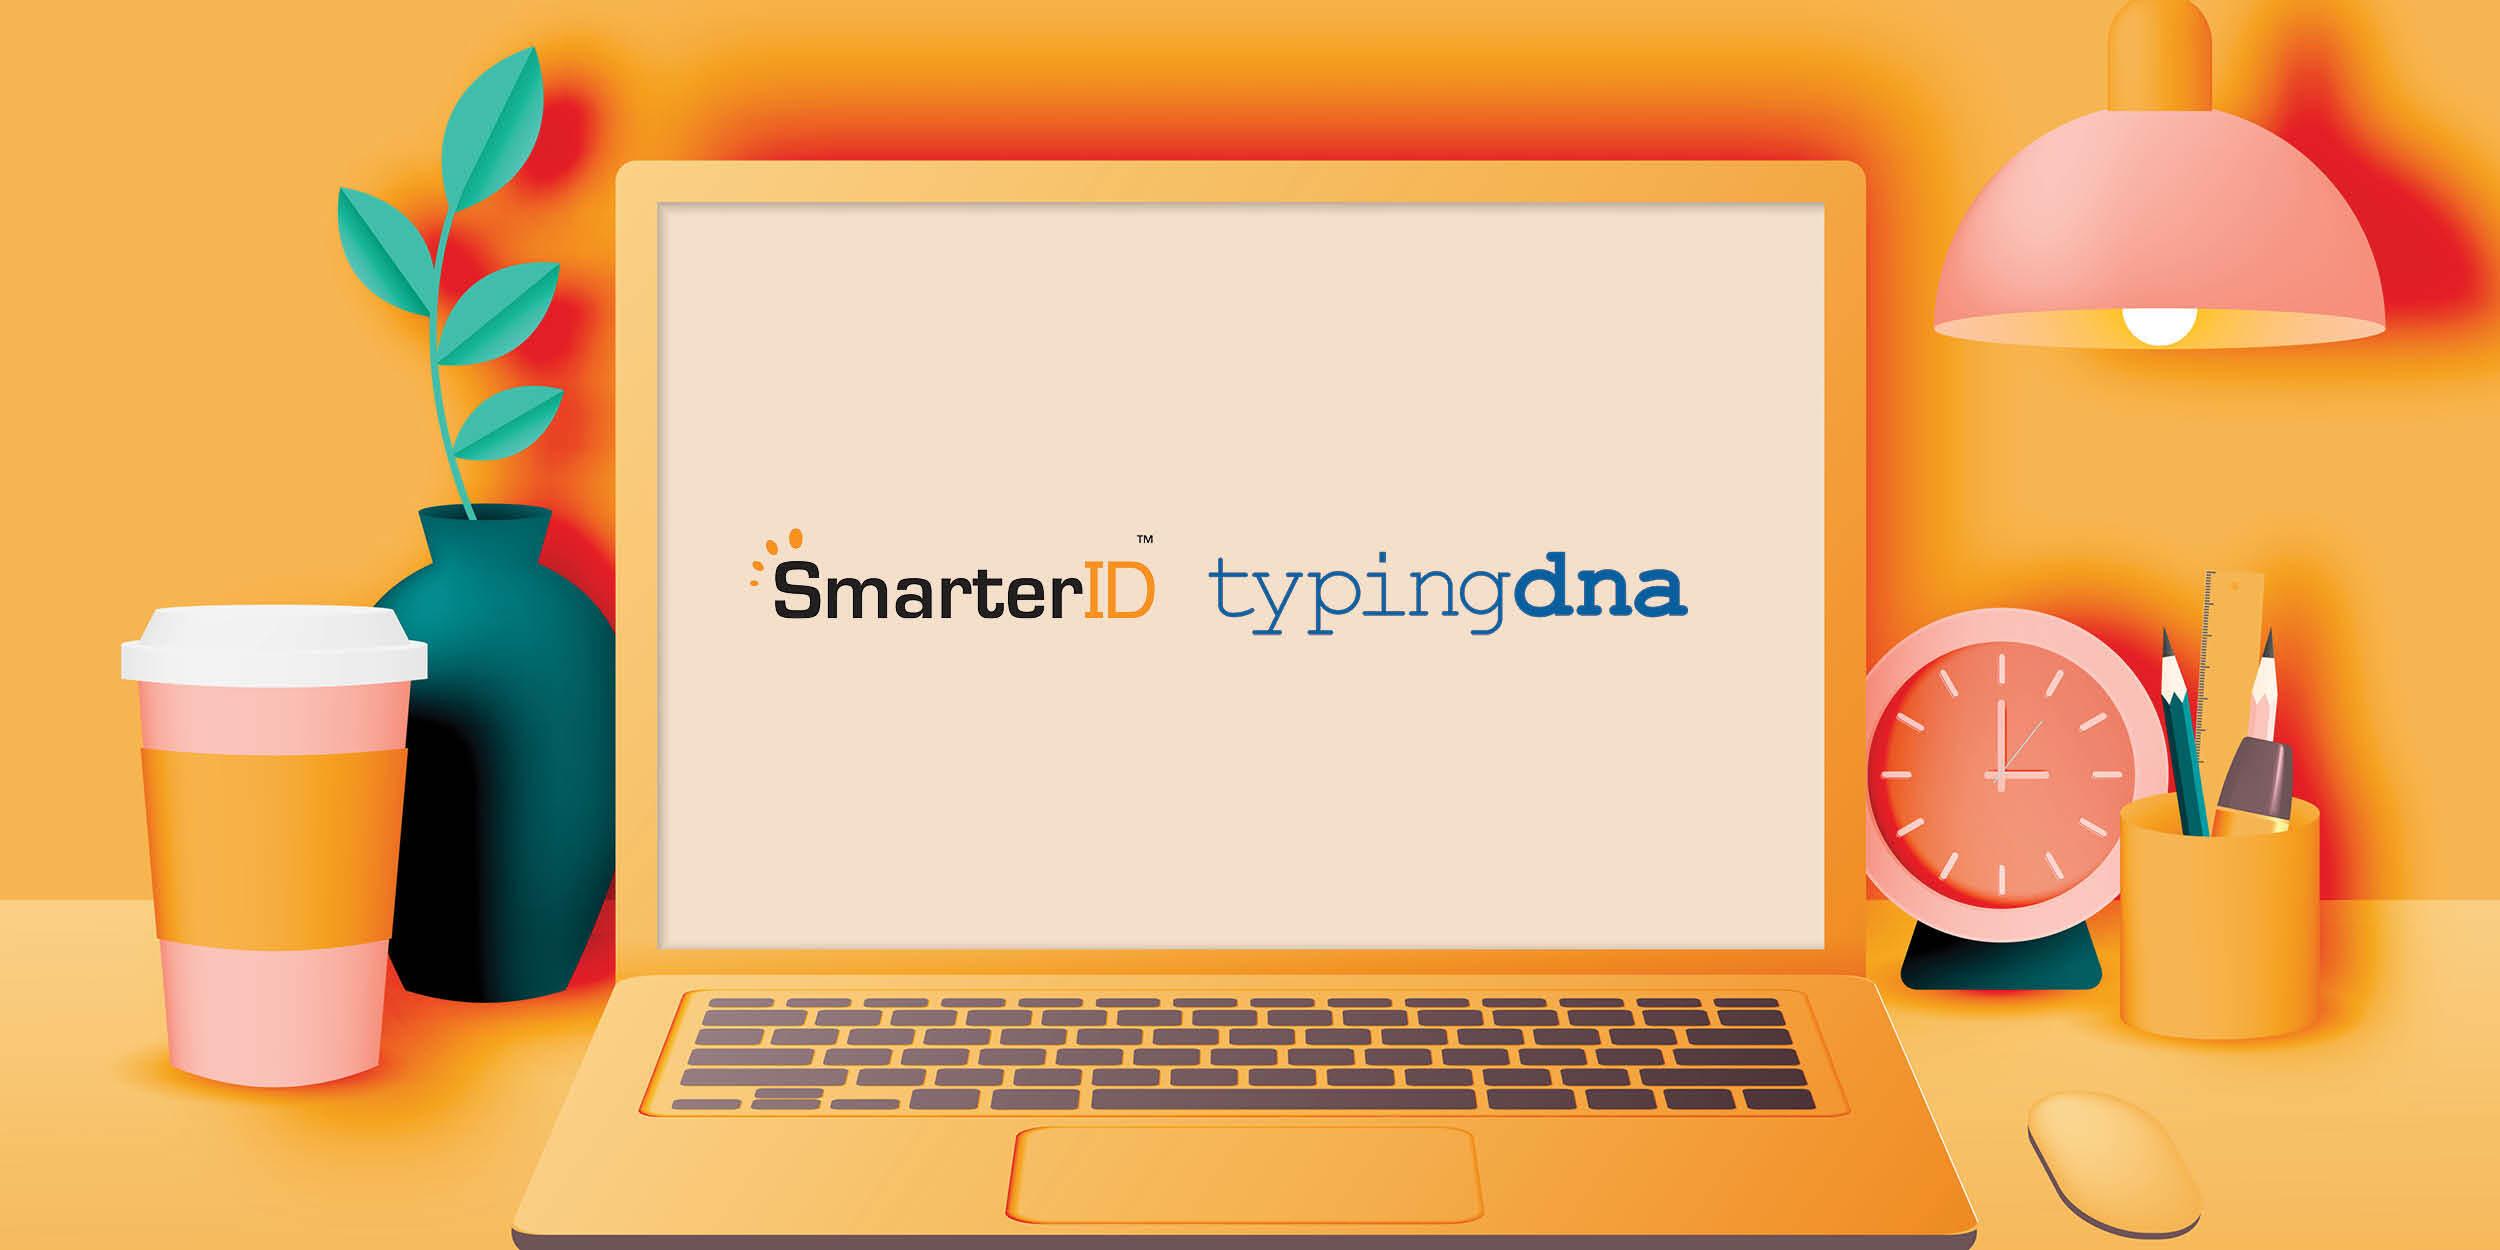 SmarterID and TypingDNA Partnership